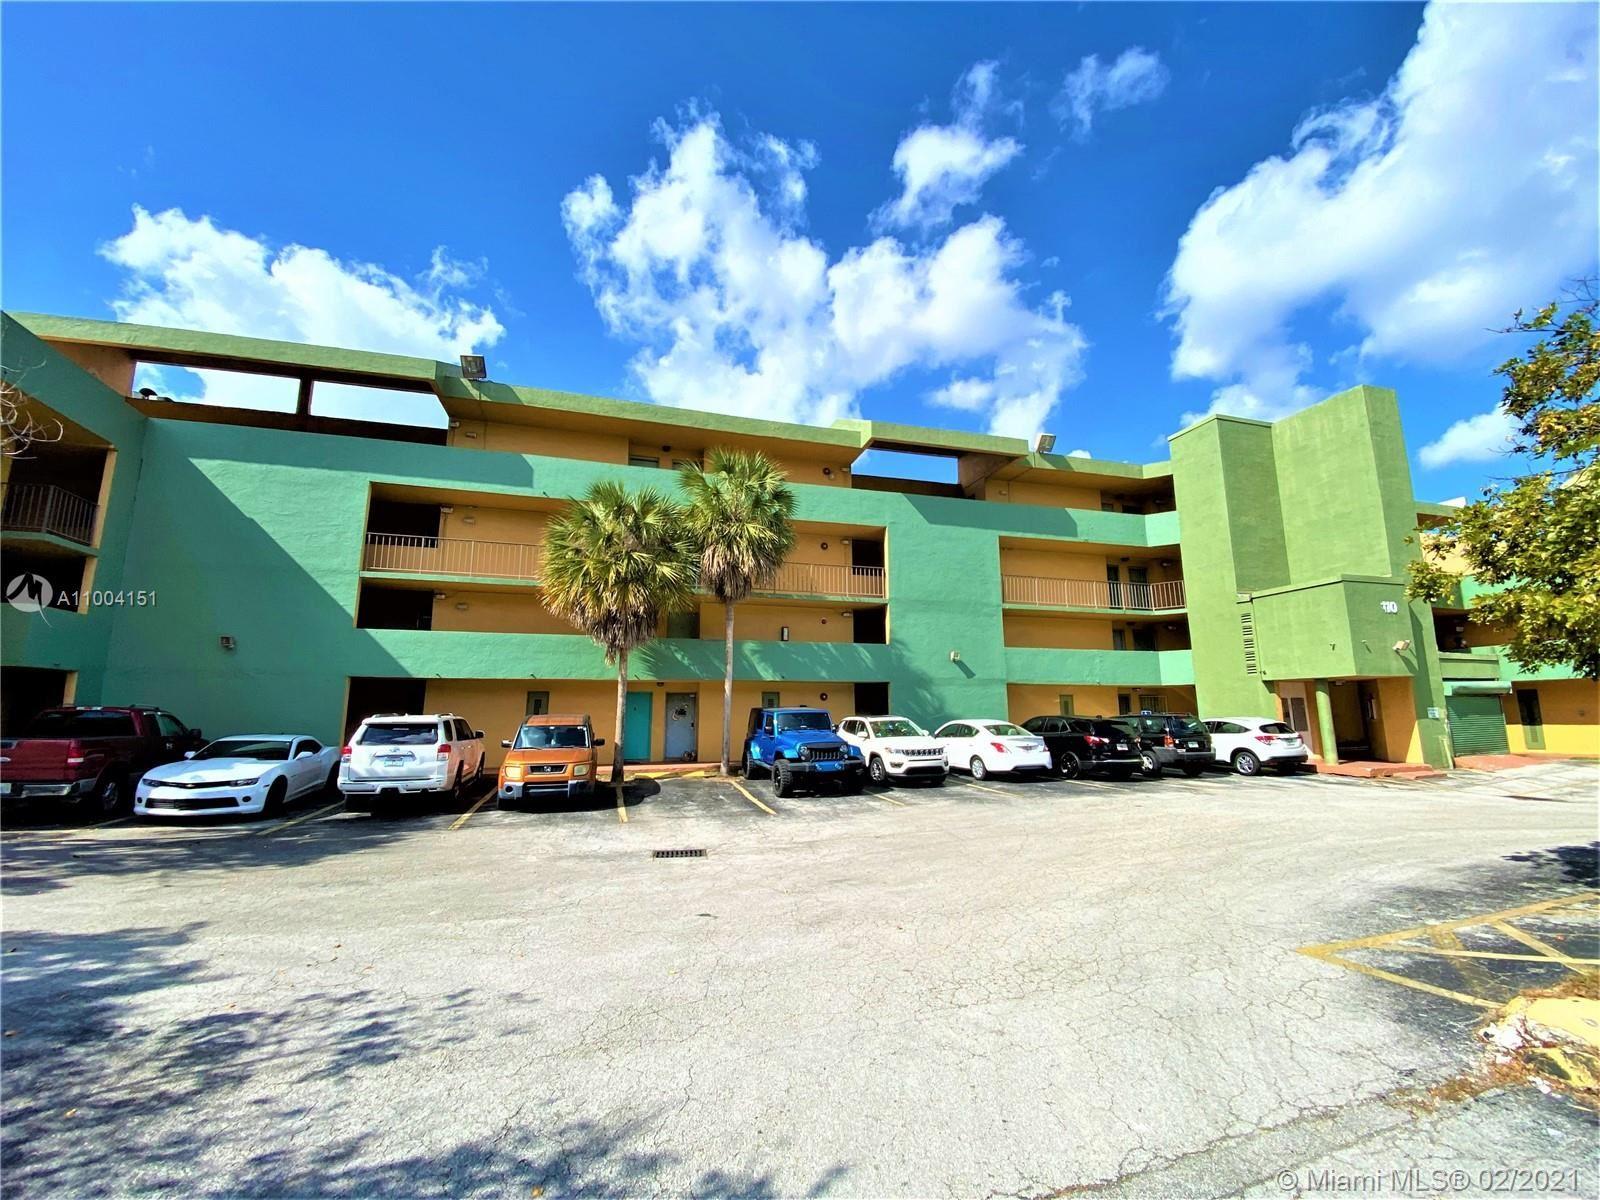 110 Fontainebleau Blvd #404, Miami, FL 33172 - #: A11004151